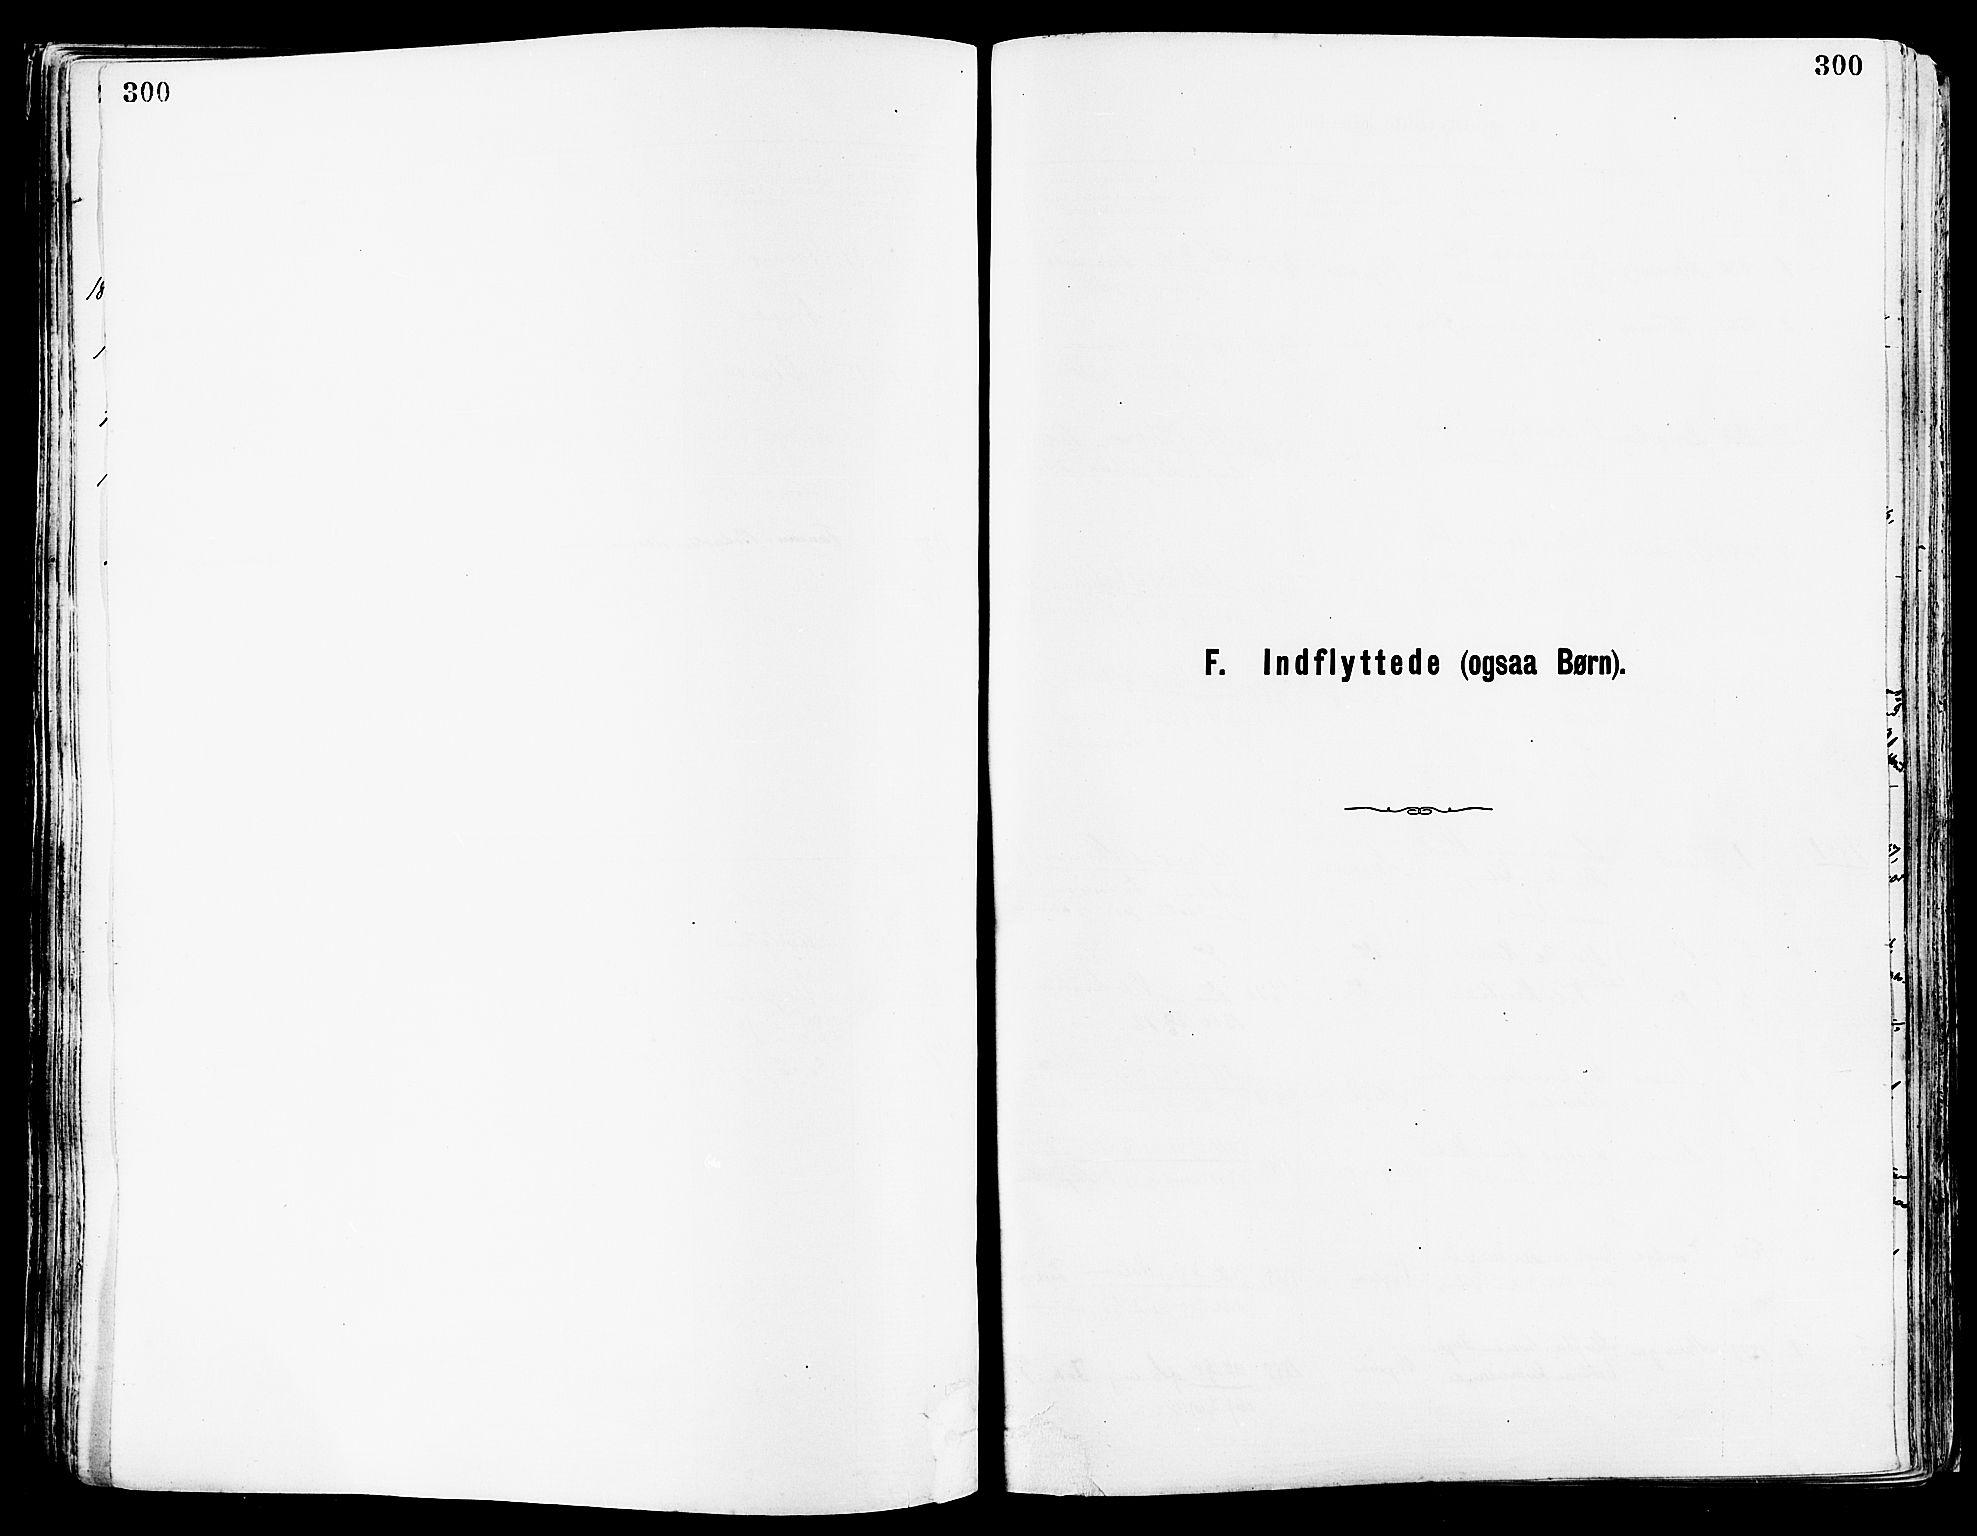 SAST, Avaldsnes sokneprestkontor, H/Ha/Haa/L0015: Ministerialbok nr. A 15, 1880-1906, s. 300